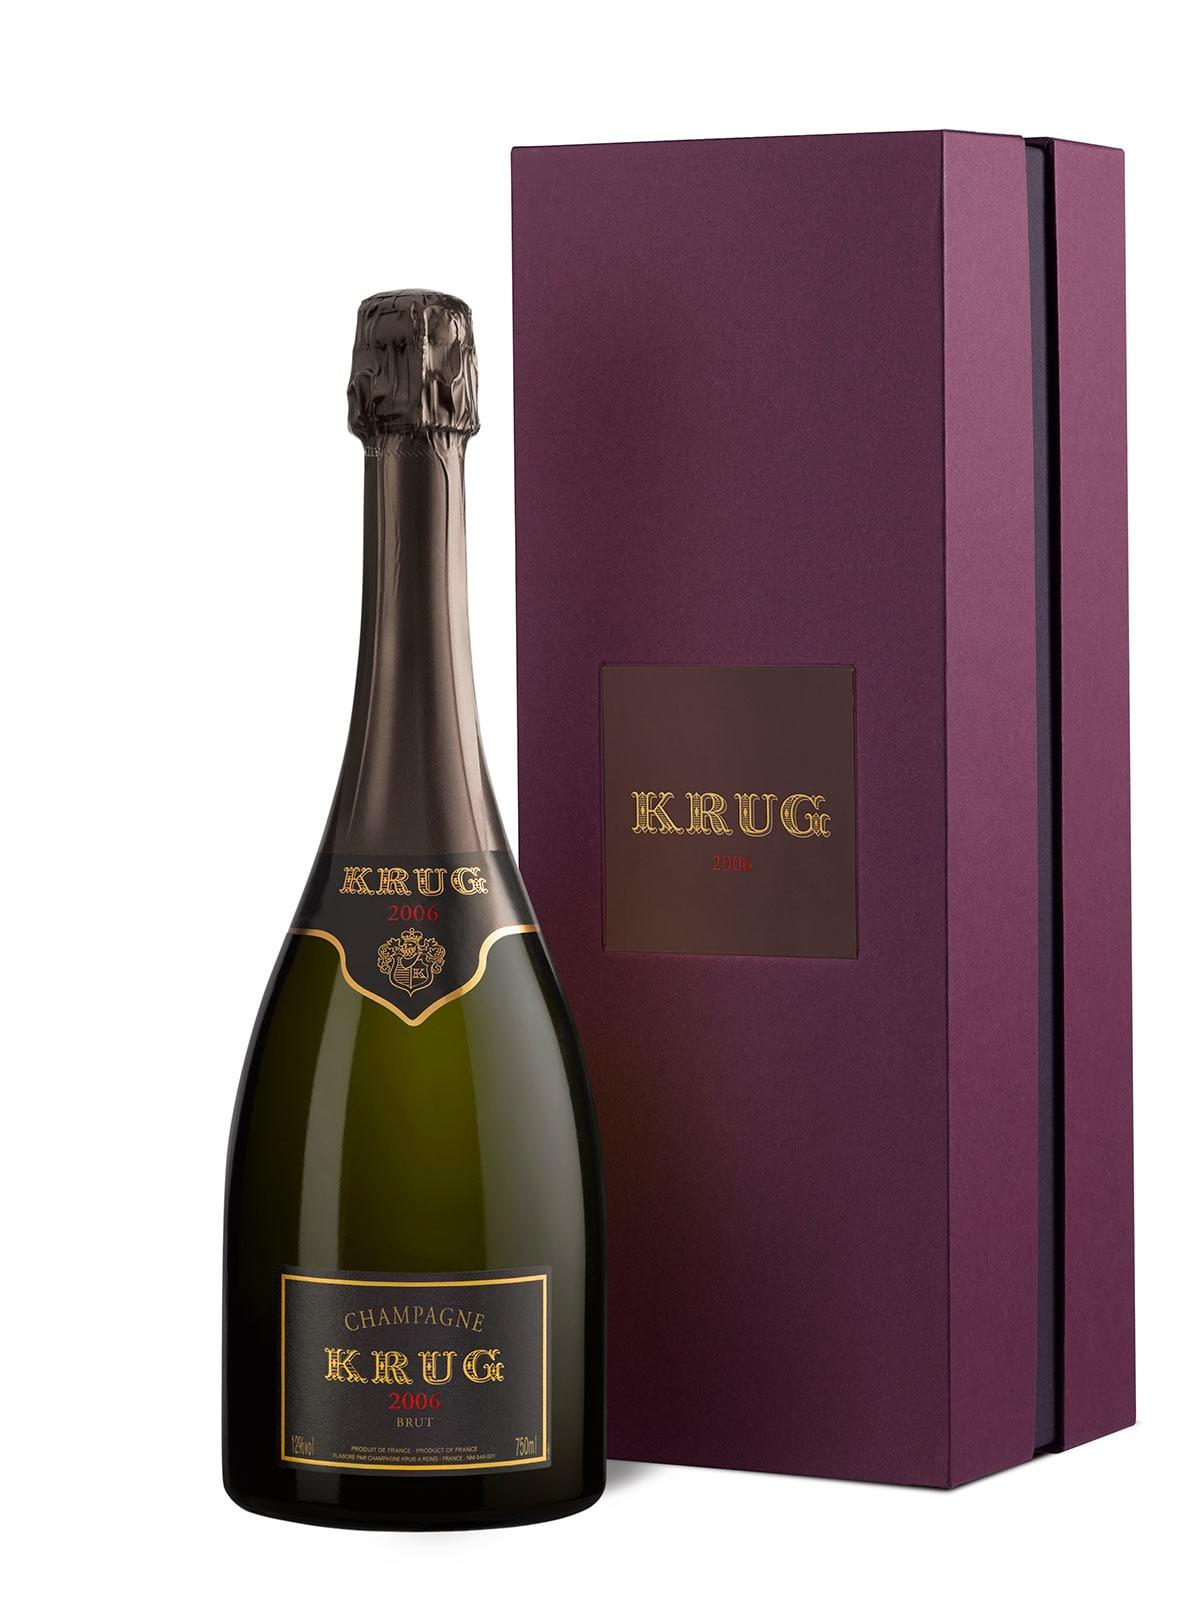 Champagne Krug 2006 750ml